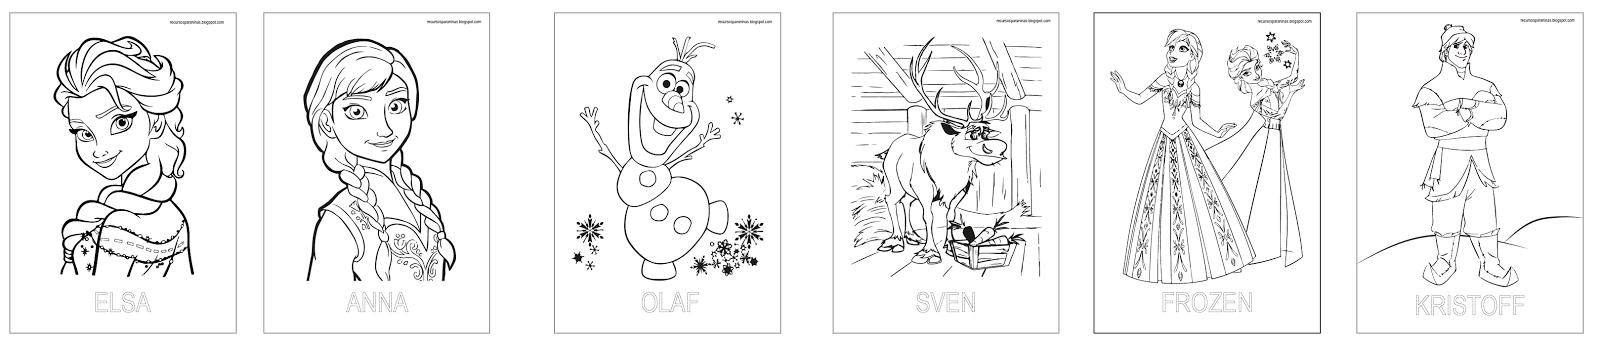 Libro fichas FROZEN para colorear PDF | Recursos para Niñ@s